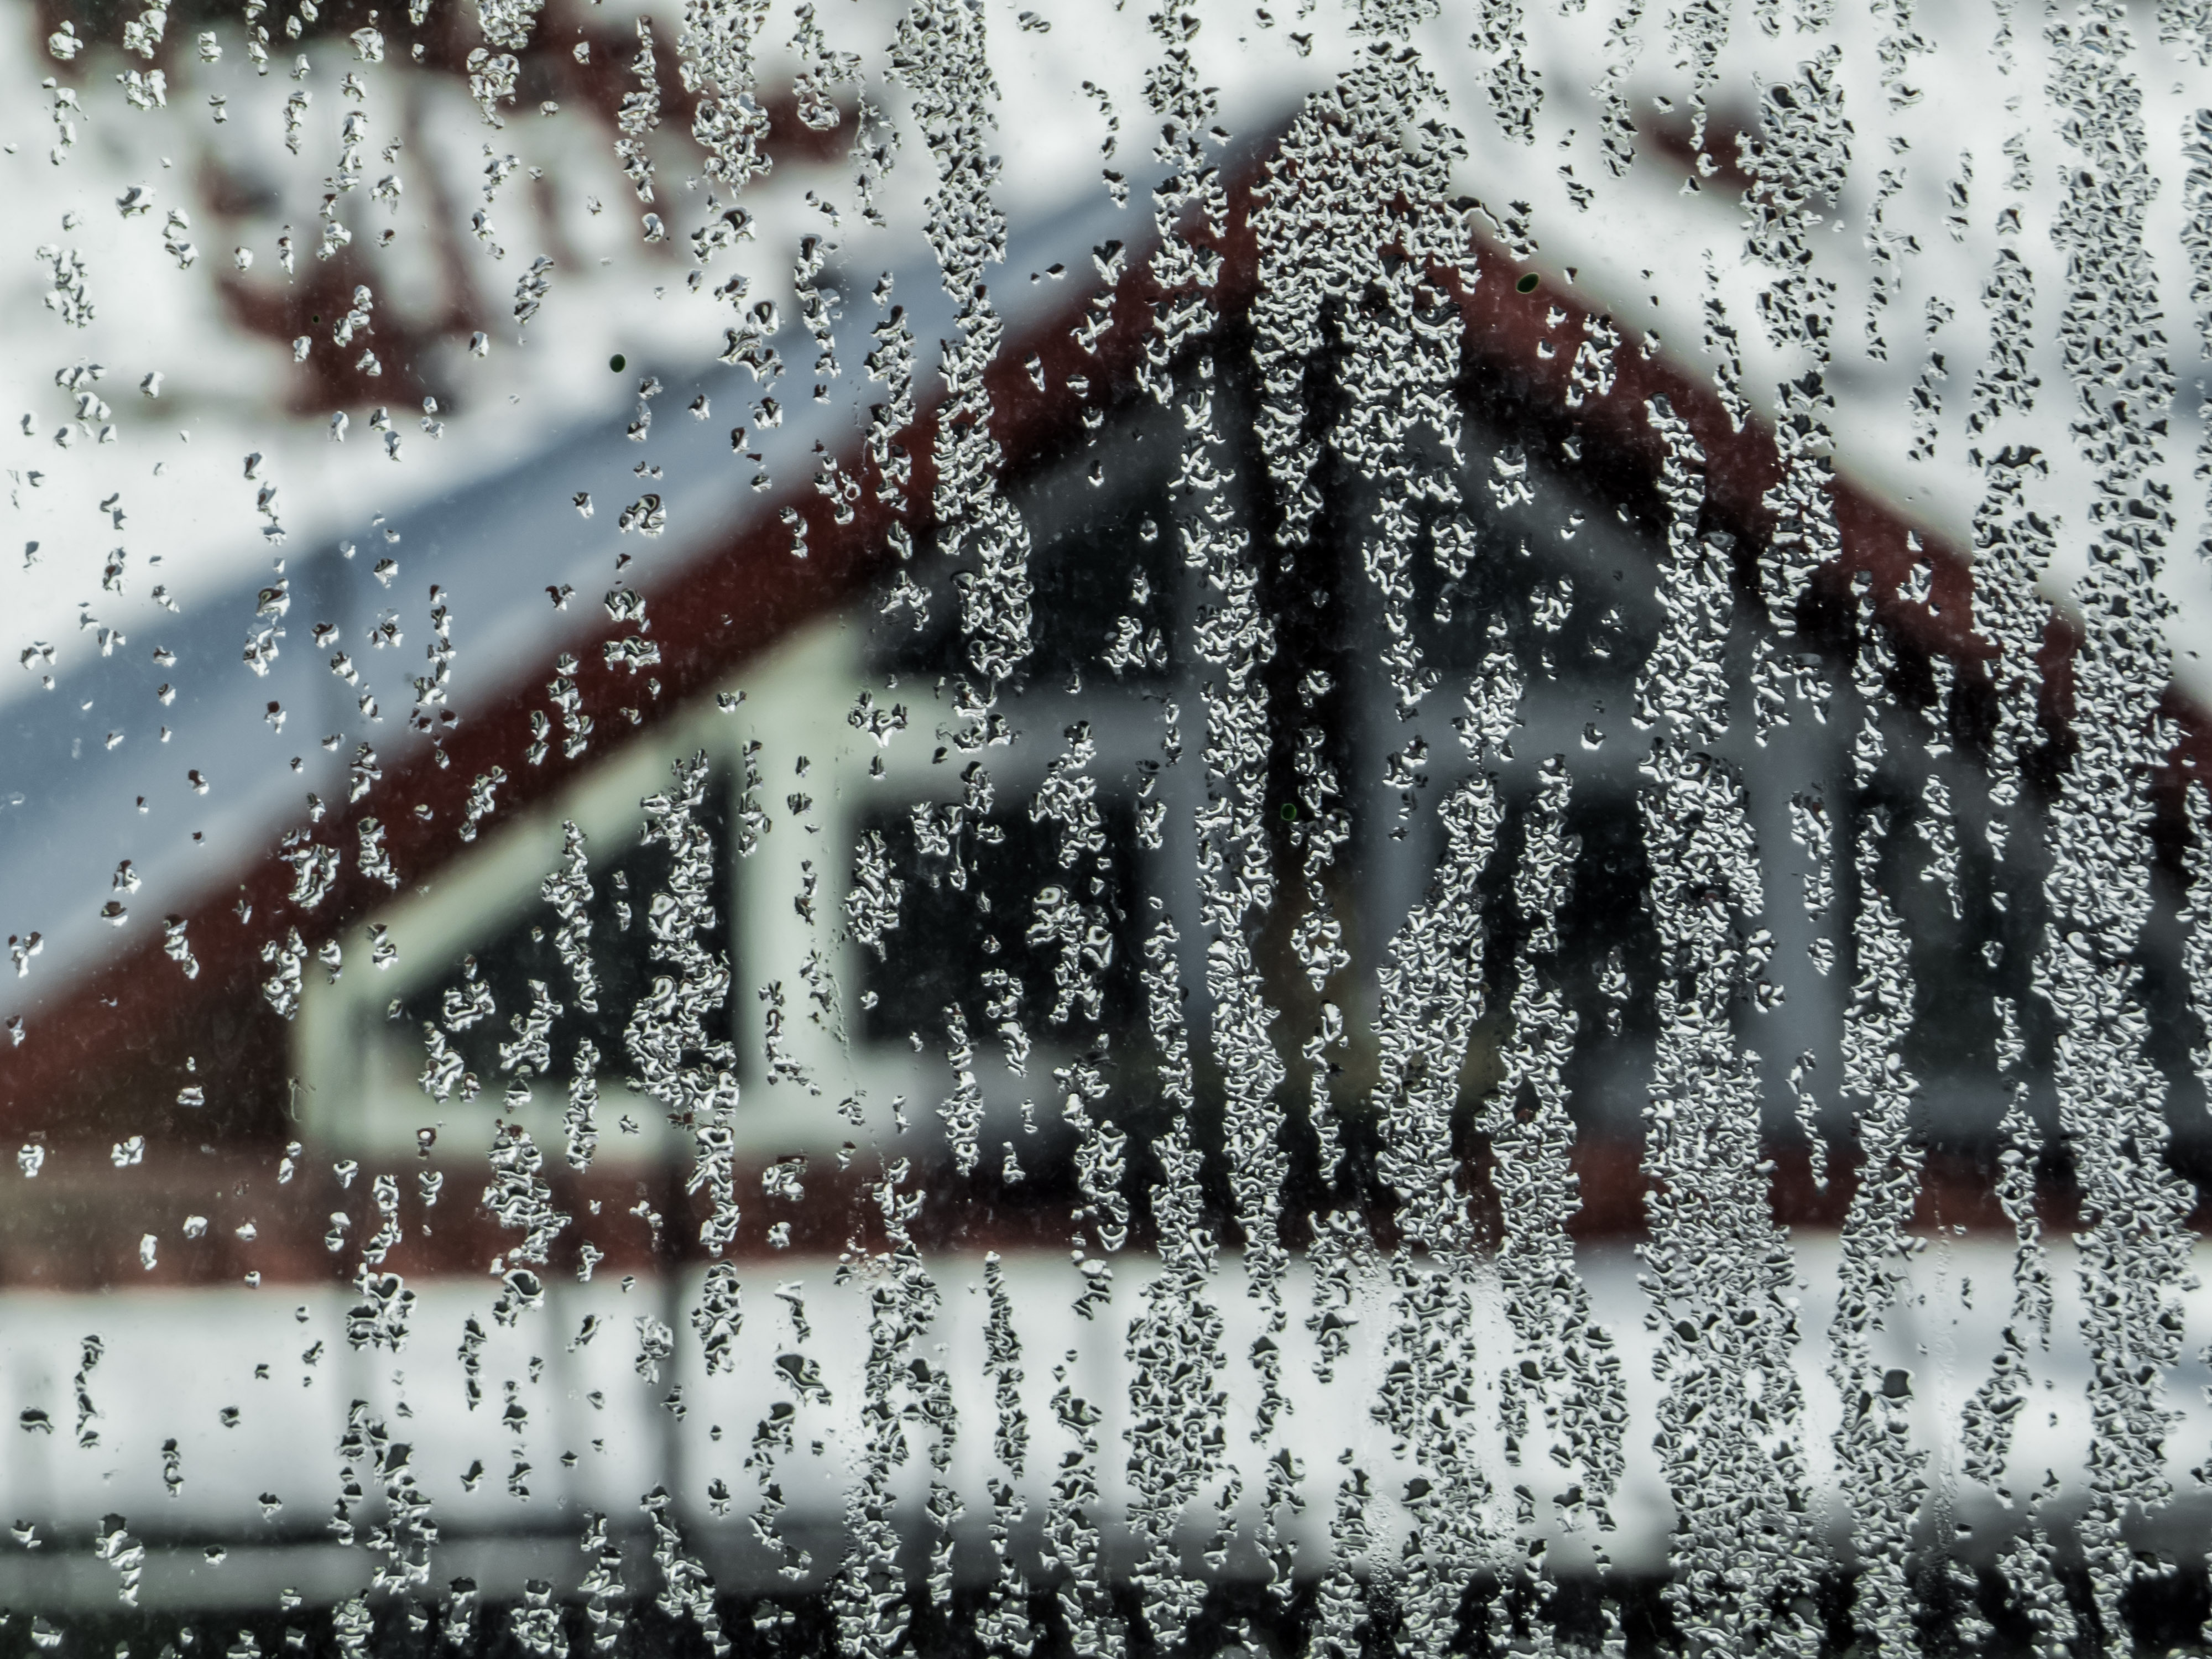 Condensate on window photo